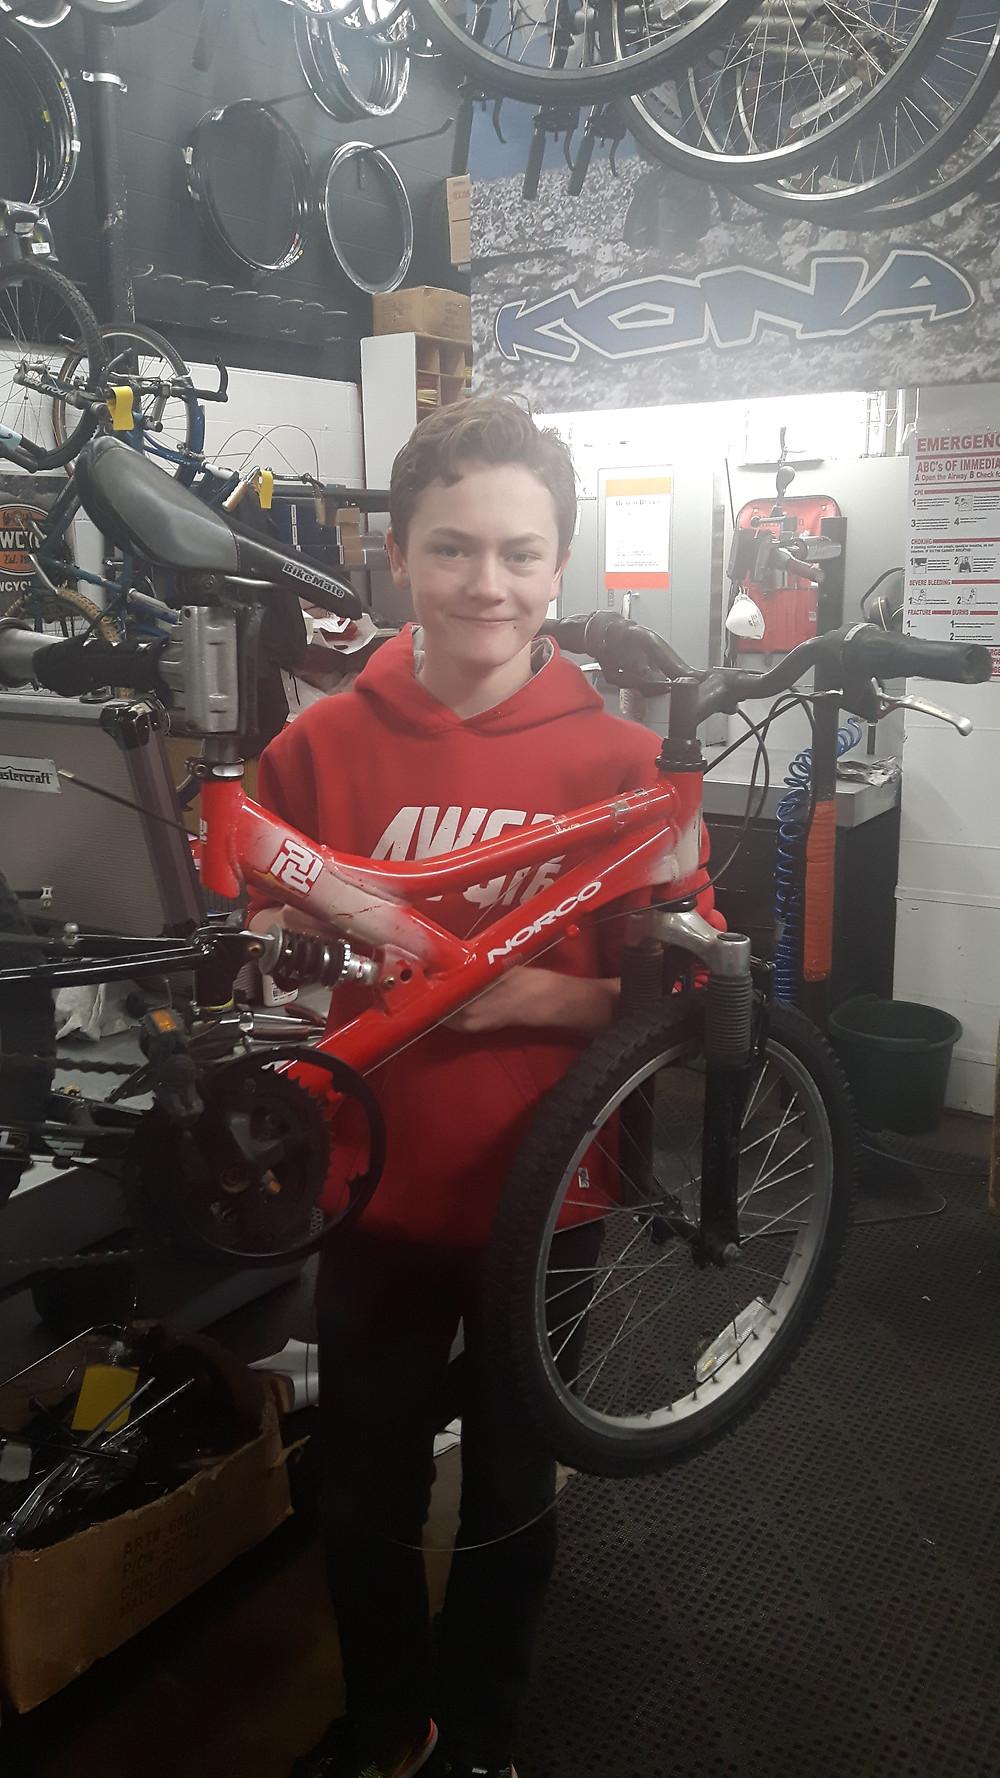 Coen working on repairs #BowCycle #Kona #Bikesforkids